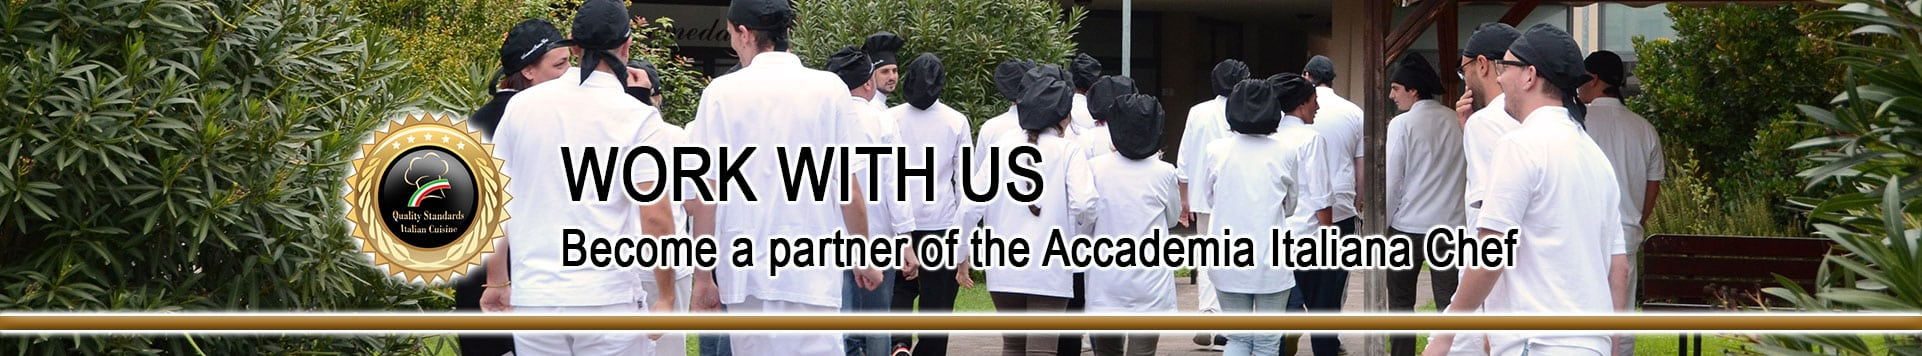 Become a Partner of Accademia Italiana Chef